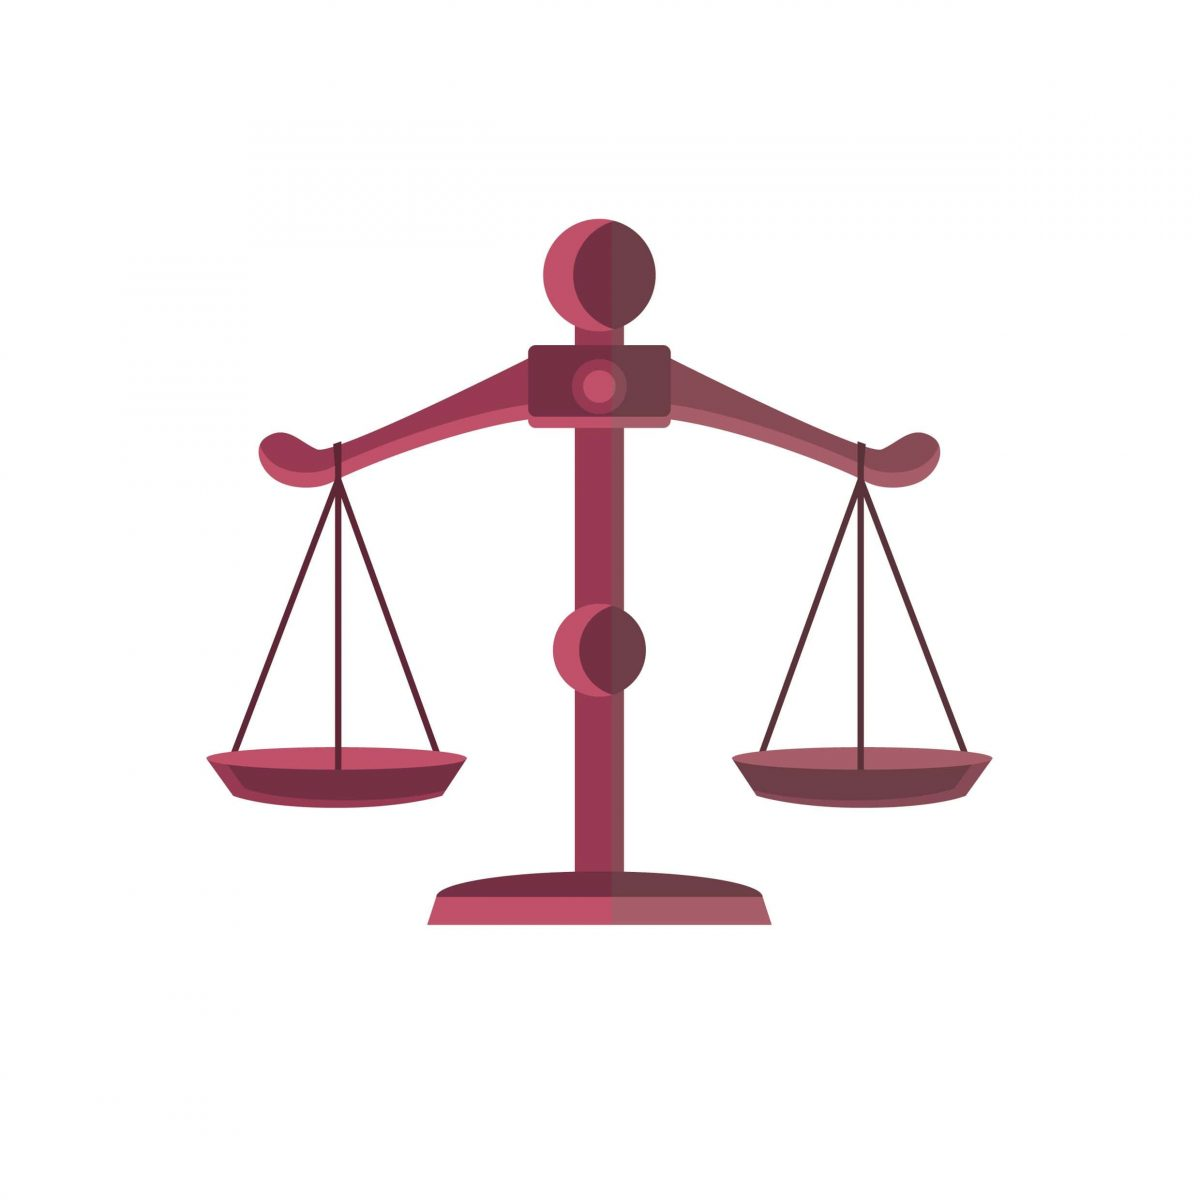 עורך דין הטרדה מינית